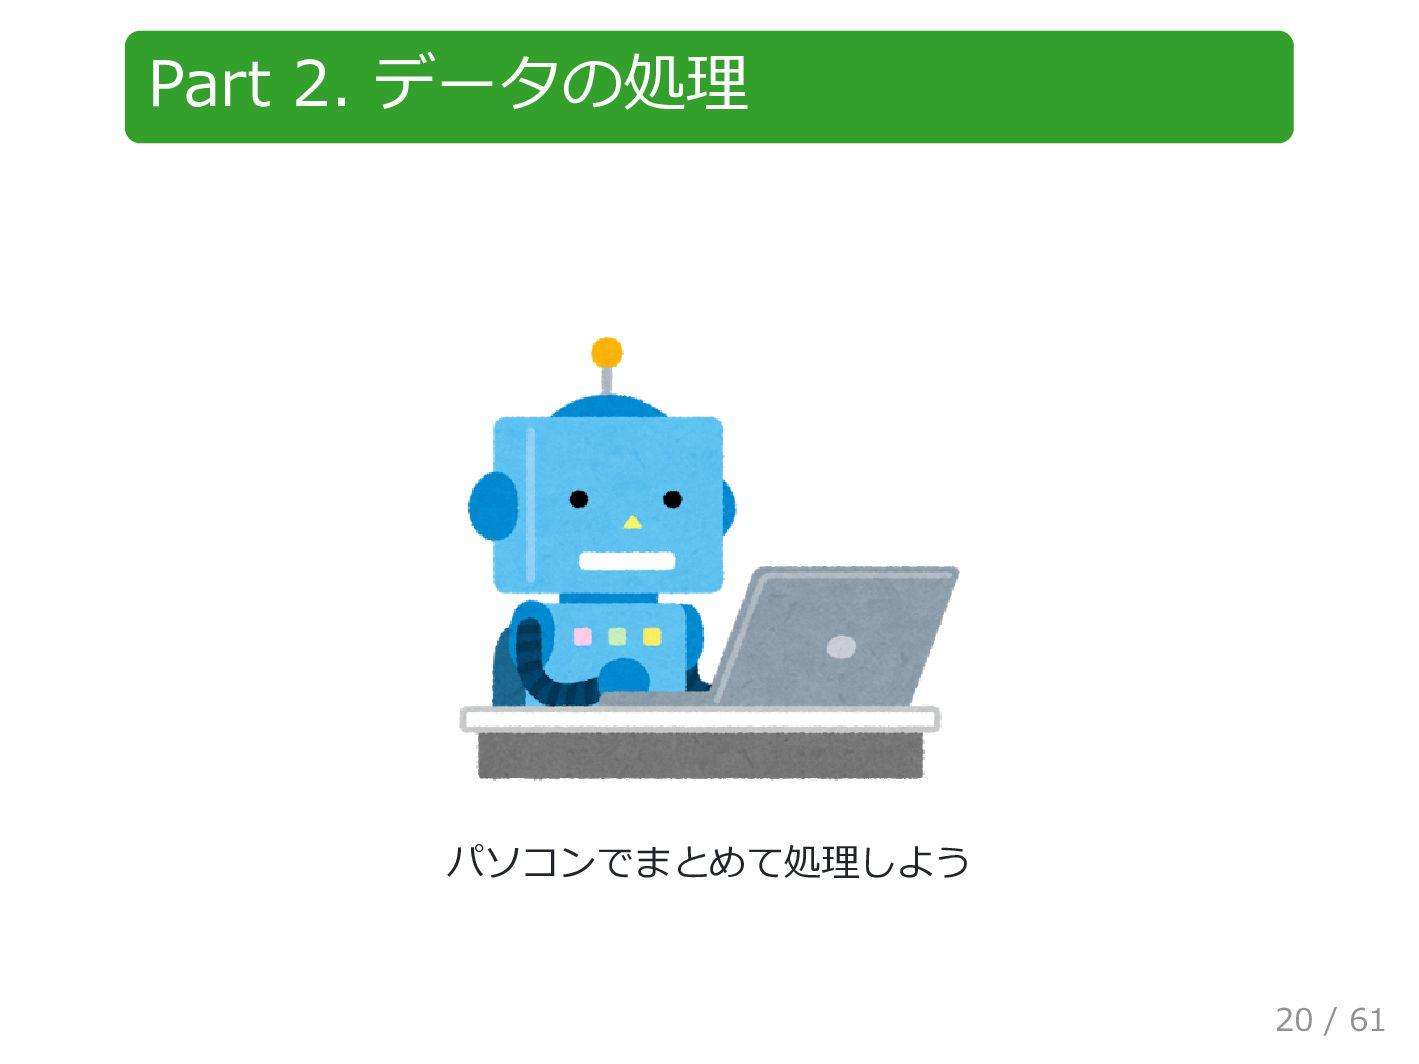 Part 2. データの処理 パソコンでまとめて処理しよう 20 / 61